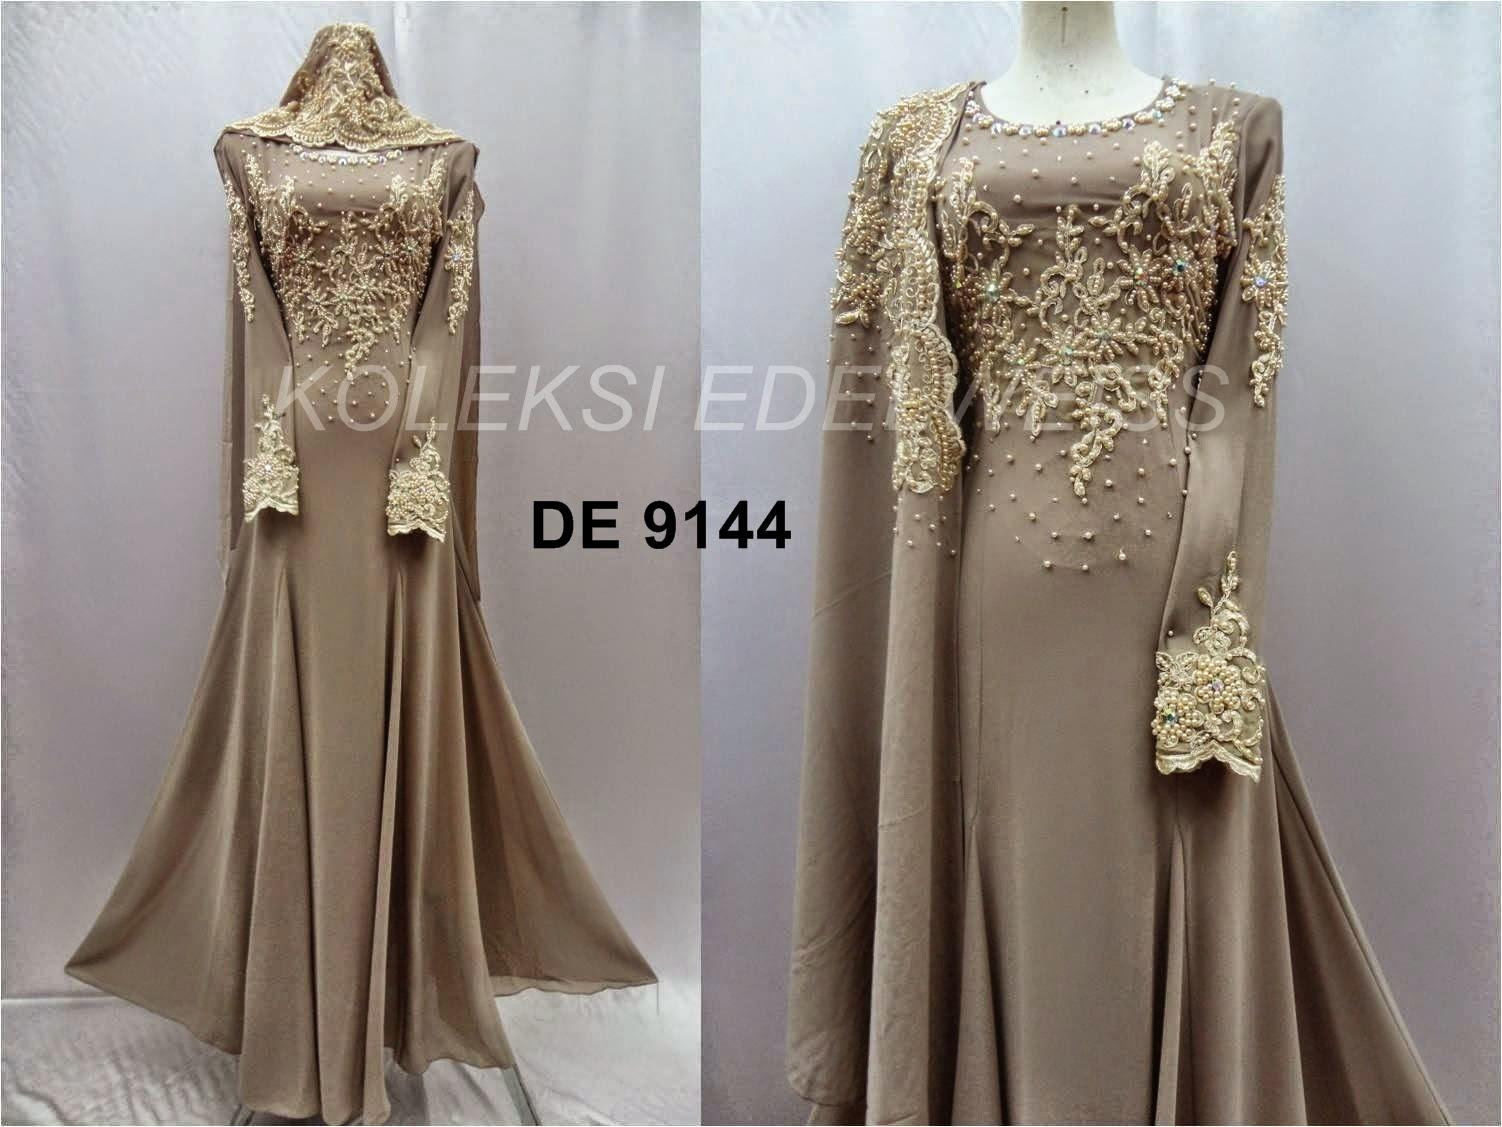 Dress Sofiya Dress Nikah dan Tunang 2015 Indah Bak Puteri